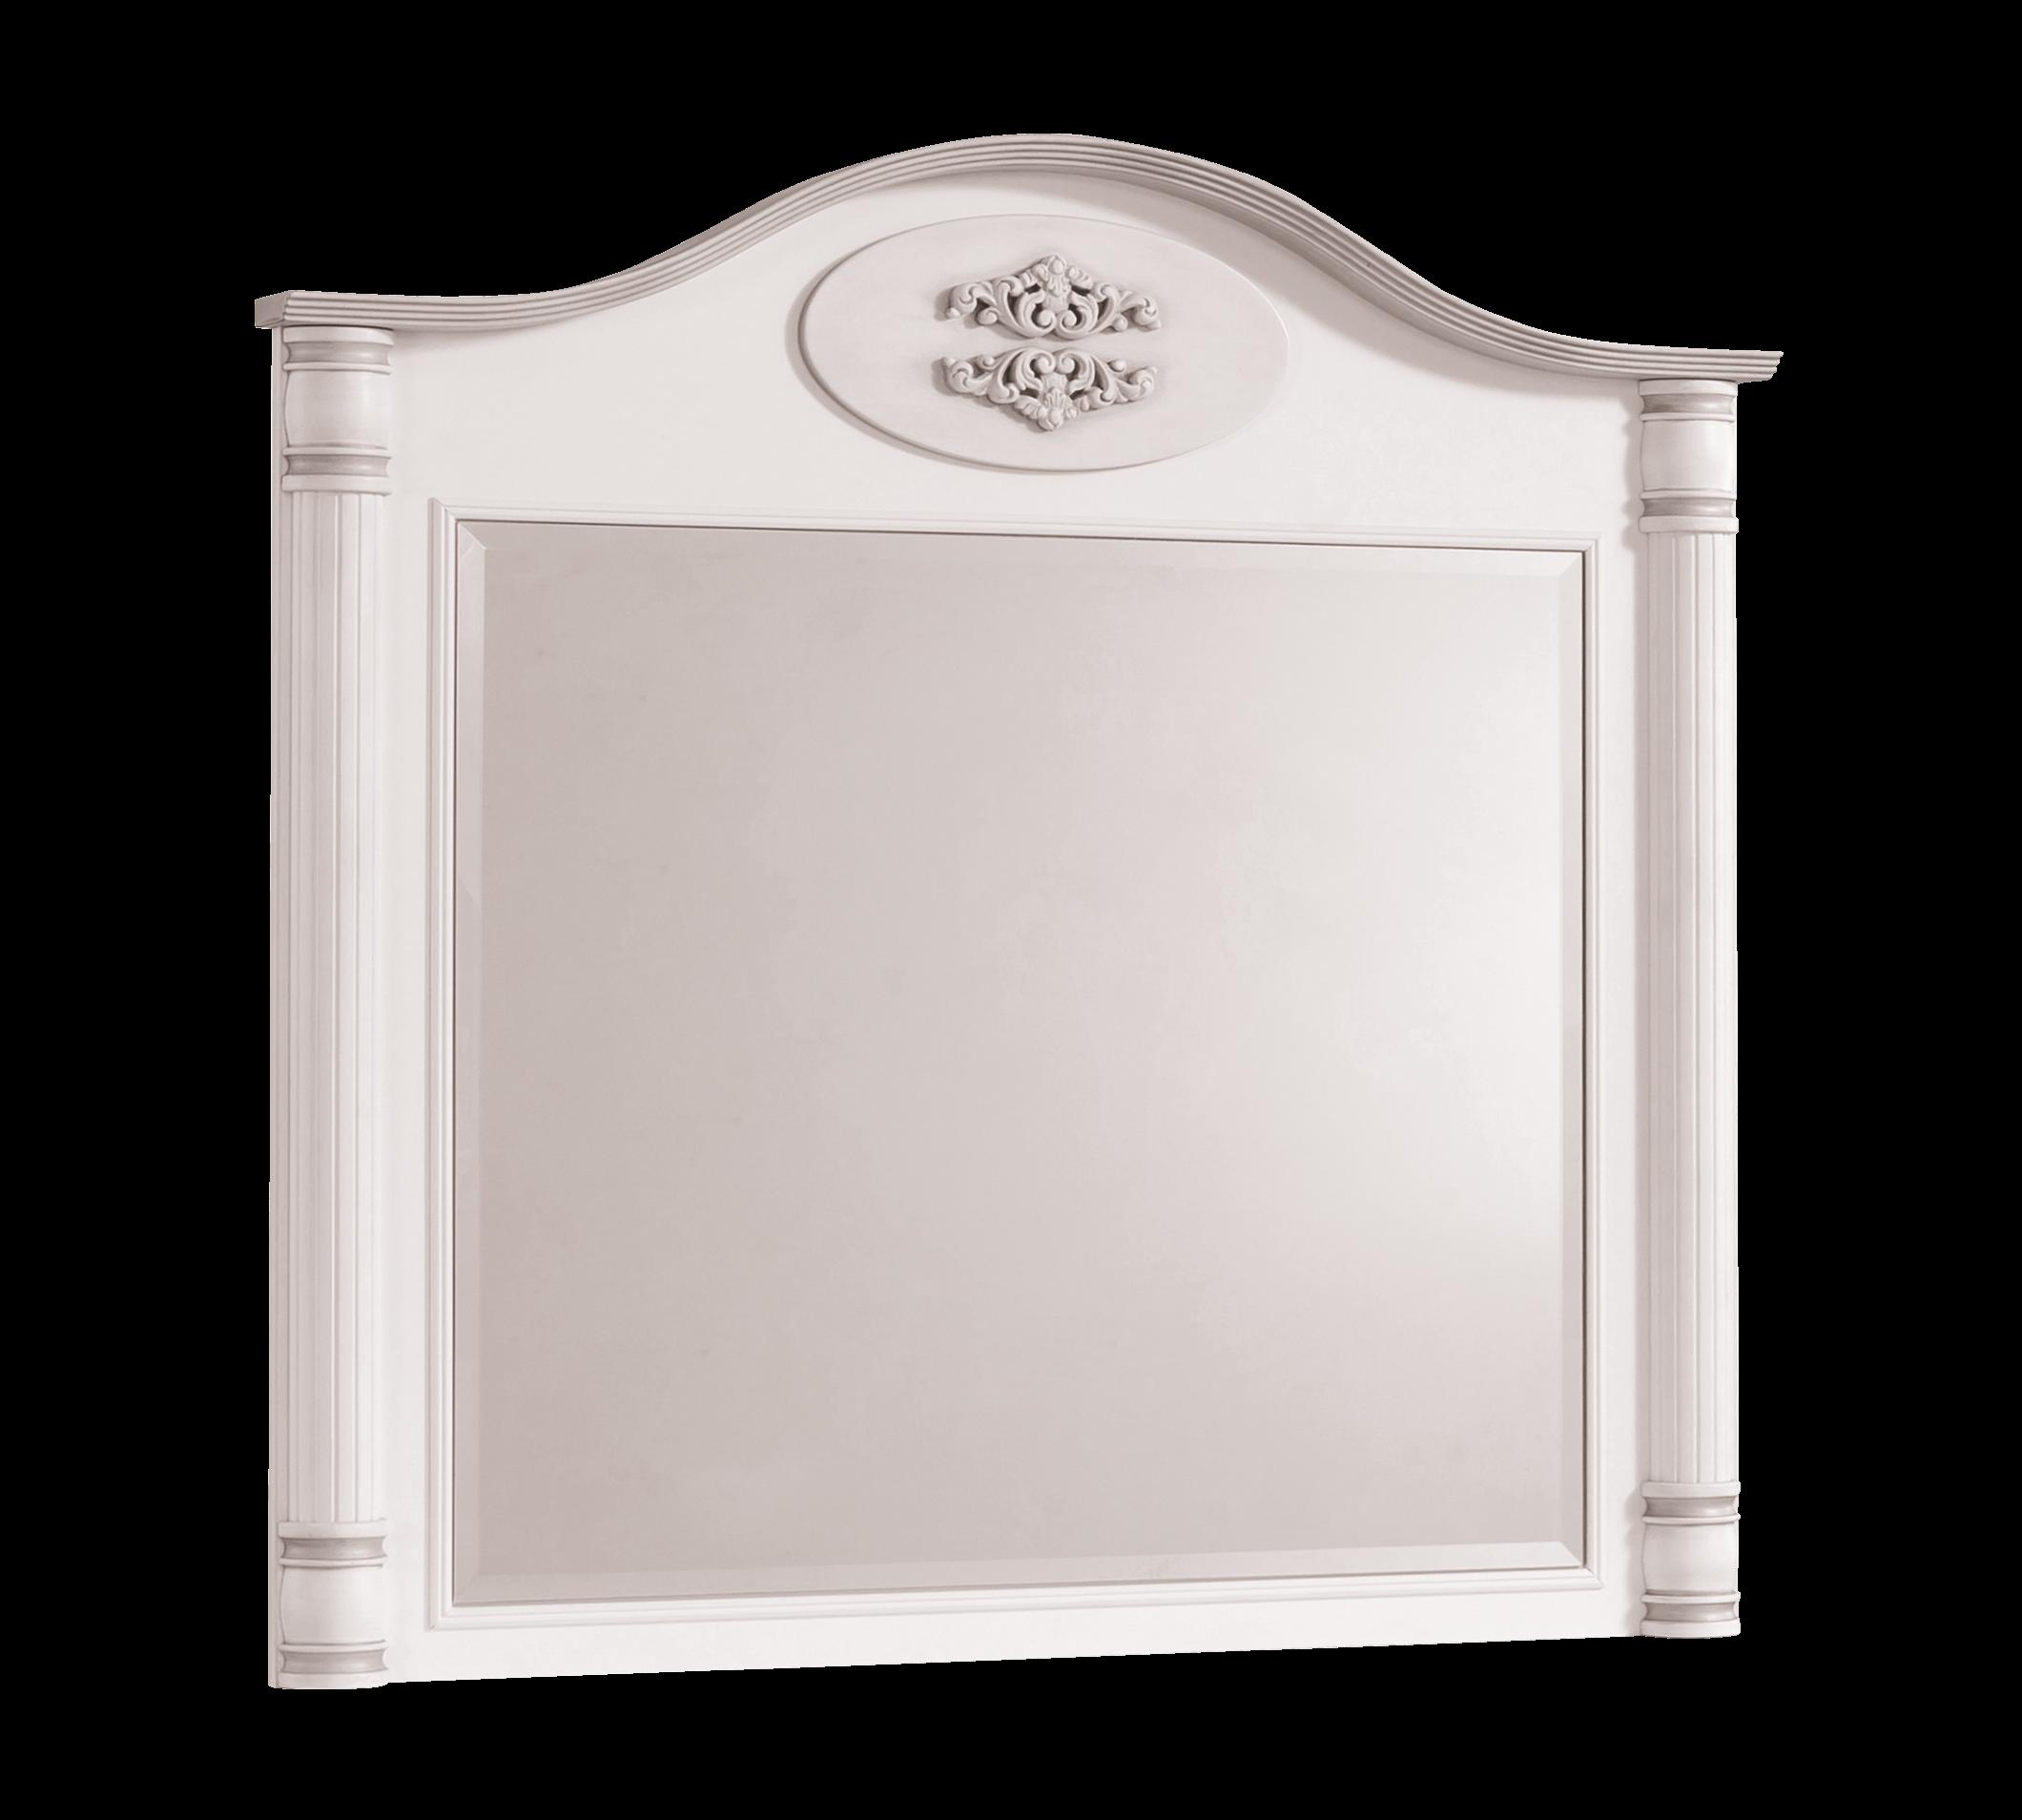 Oglinda decorativa cu rama din pal, pentru copii si tineret Romantic White, l90xA7xH88 cm